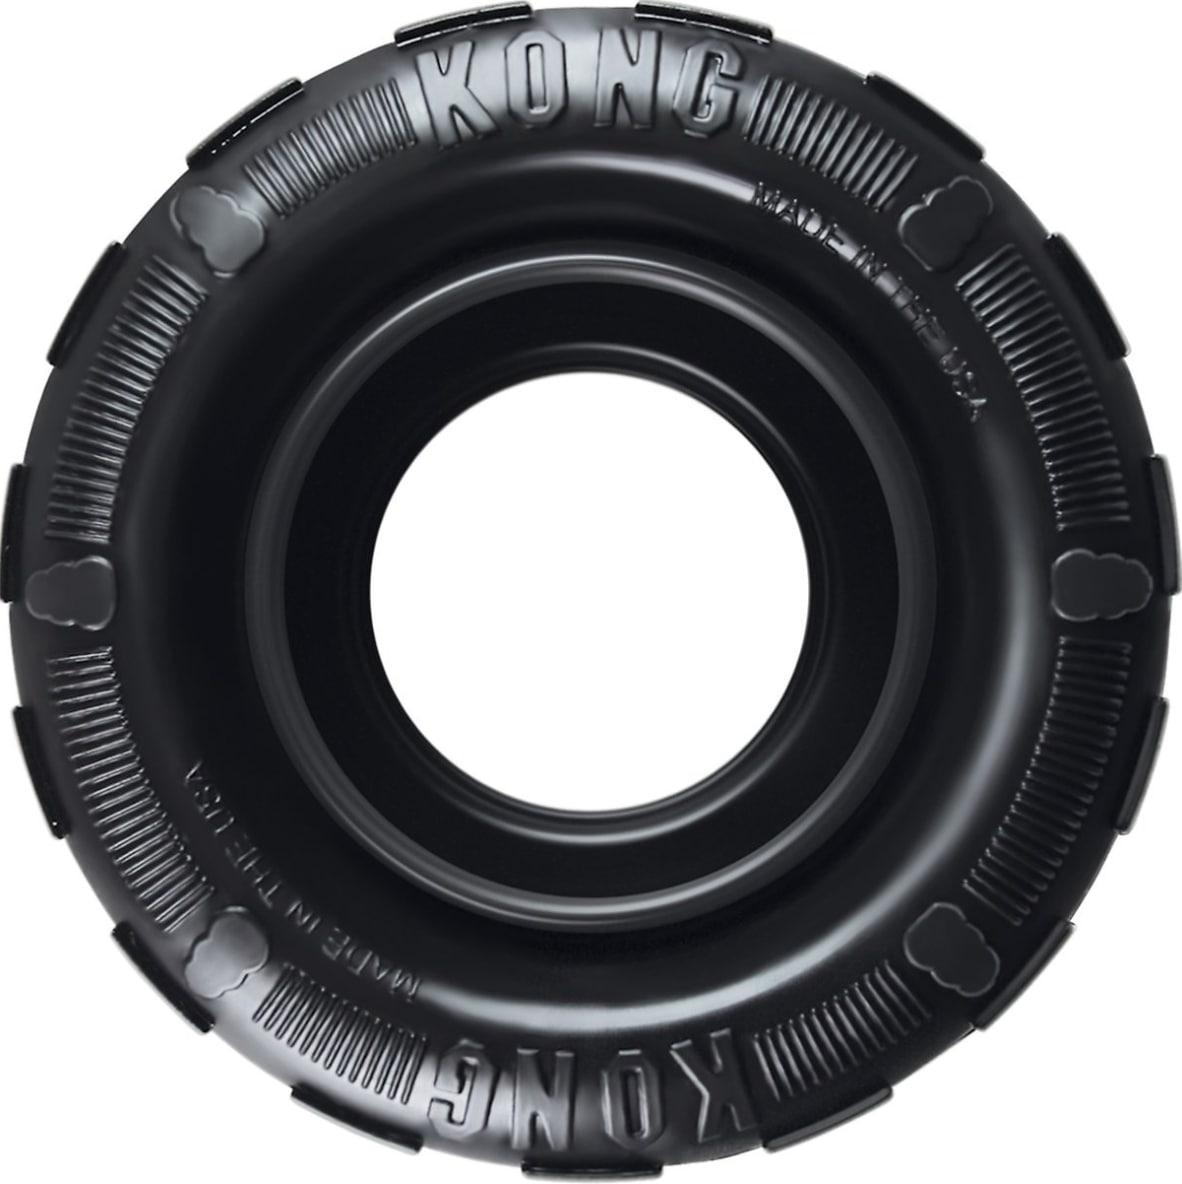 Extreme Tire